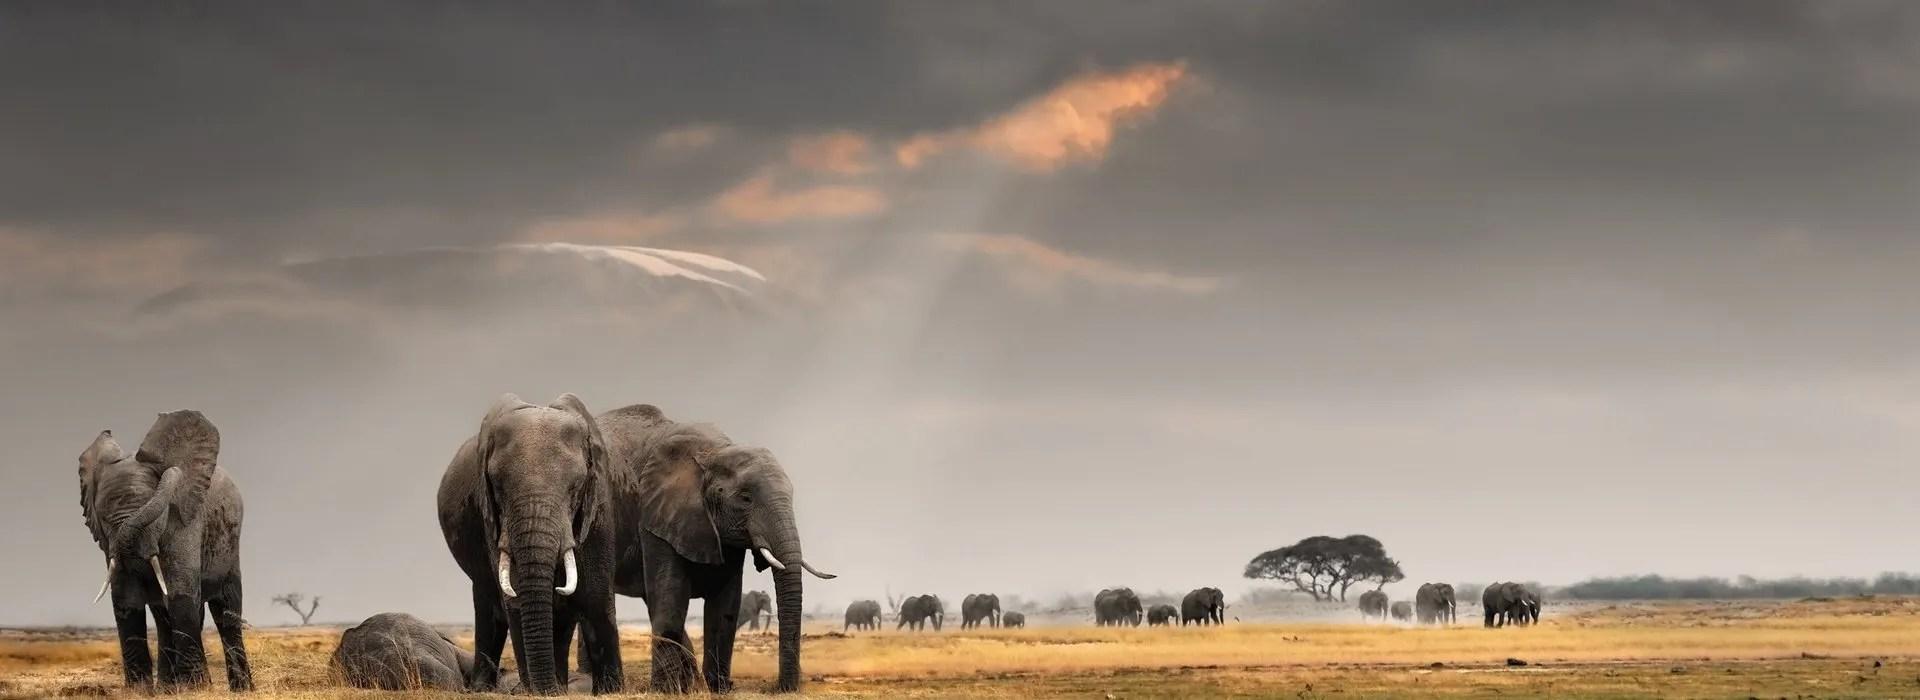 Africa Safaris - Elephants